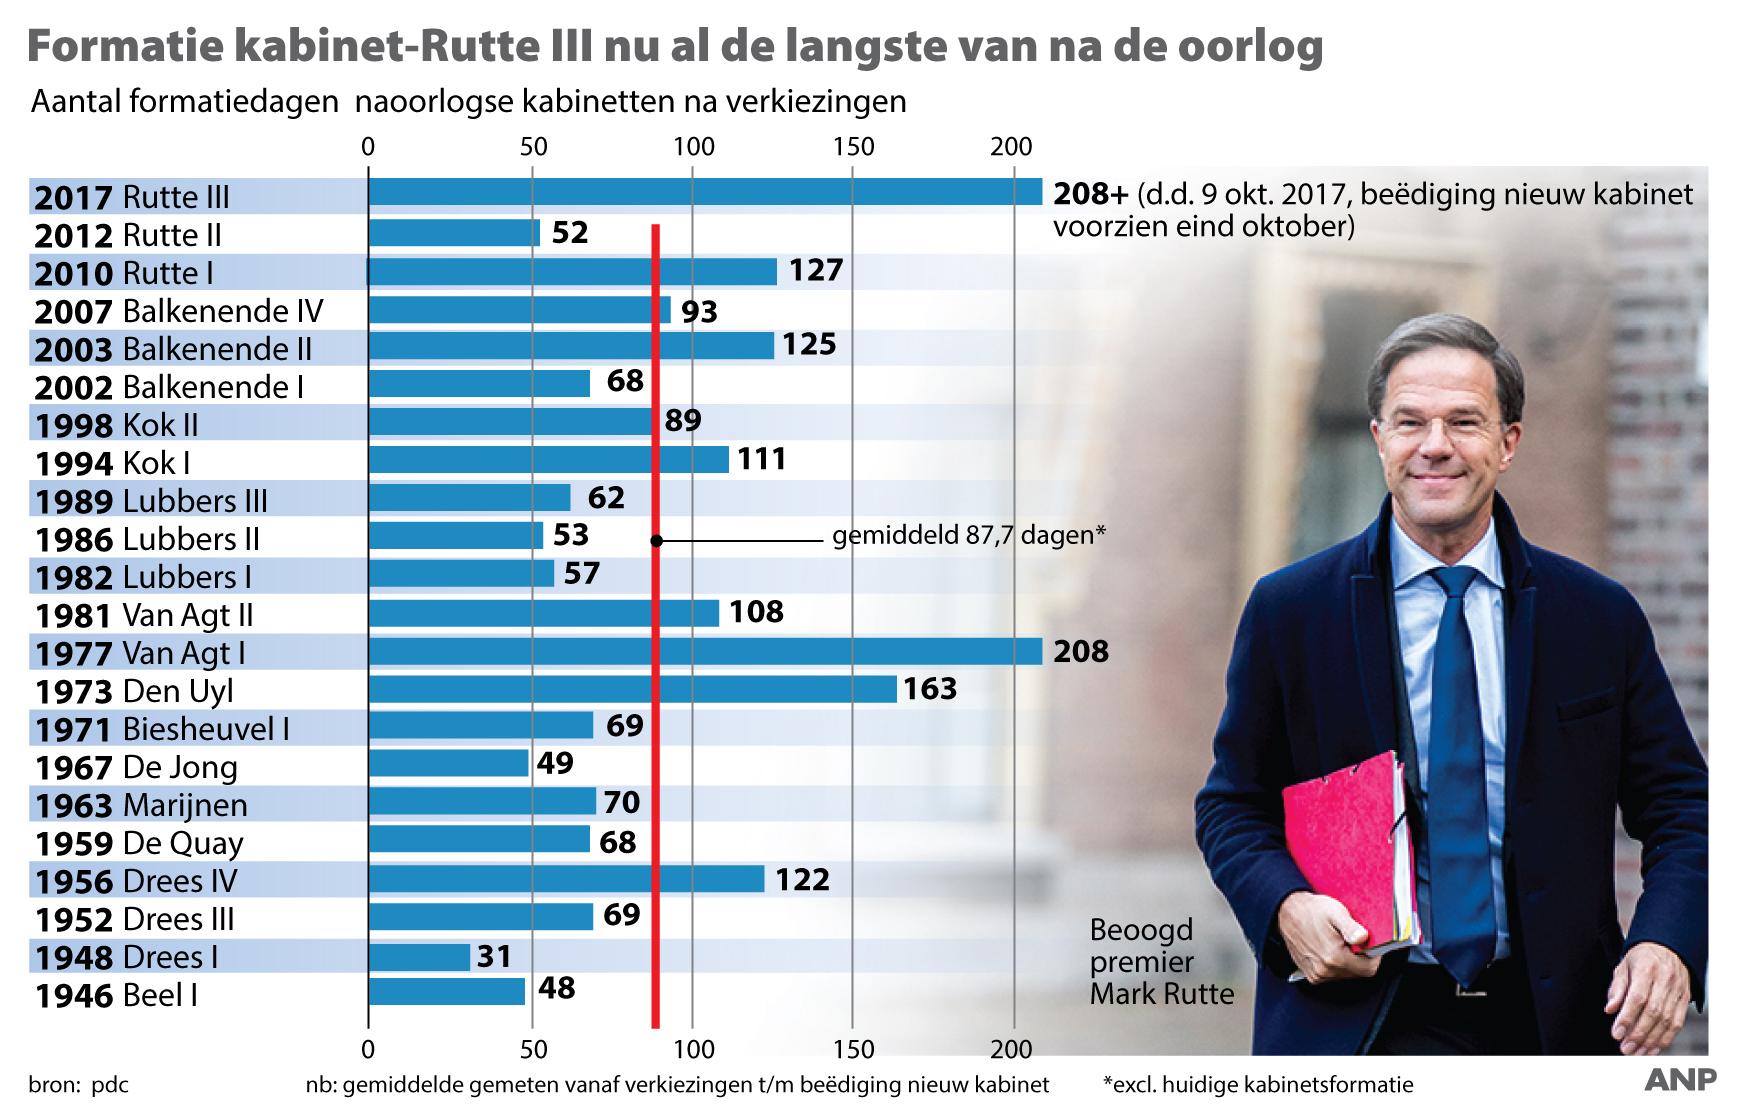 Rutte III: Wat doet dit kabinet voor jou?